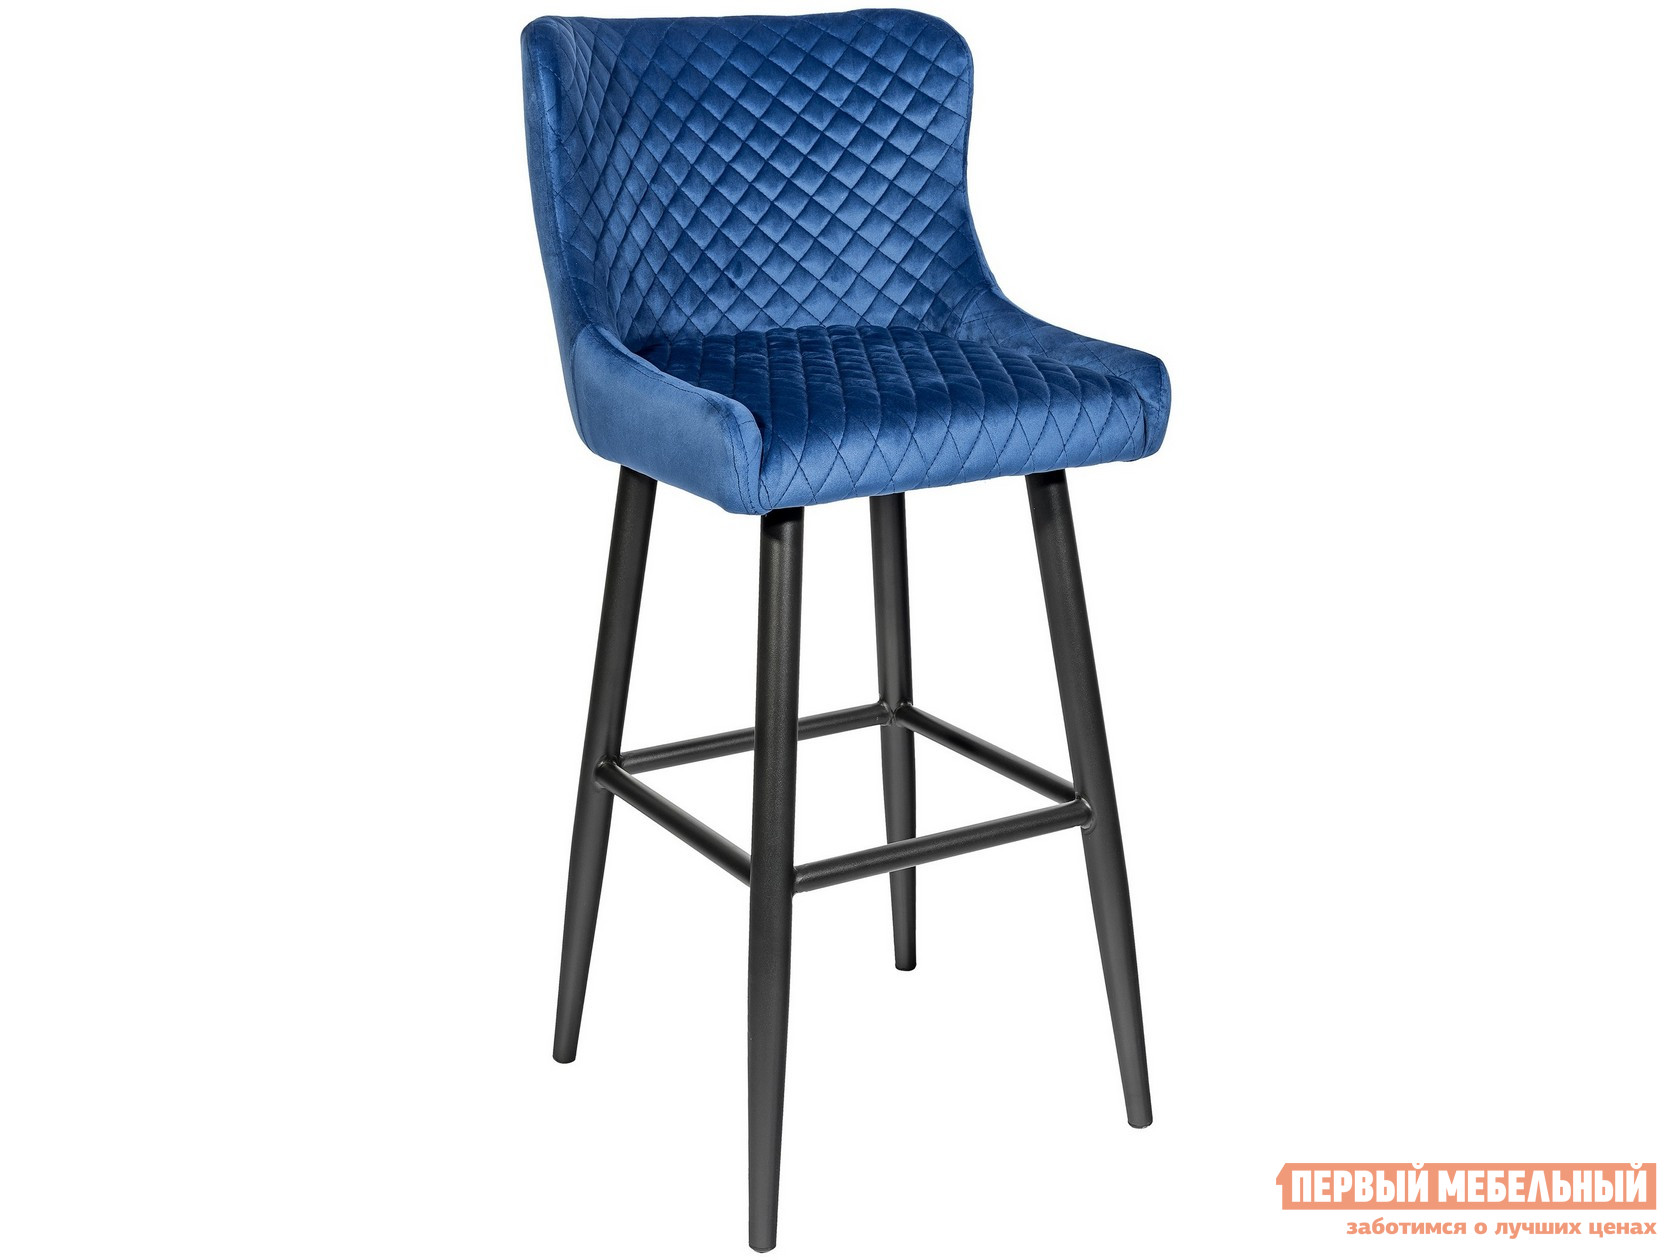 Барный стул  MC15B HLR-65 Королевский синий, велюр STOOL GROUP 85891